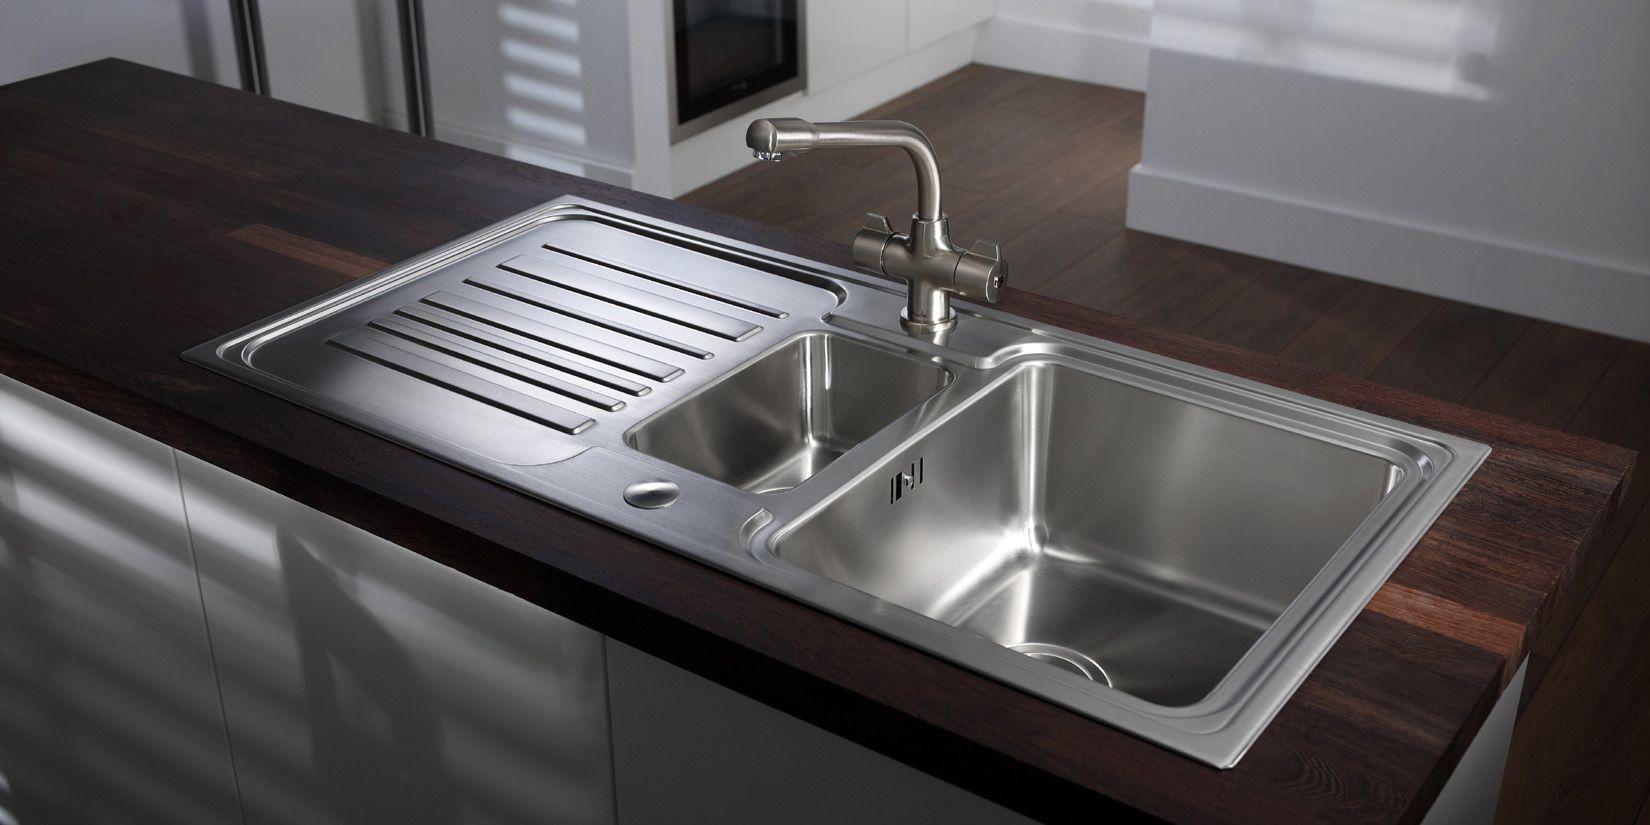 Pin By Jason Alberty On Furnishings Miscellaneous Kitchen Sink Design Small Kitchen Sink Modern Kitchen Sinks